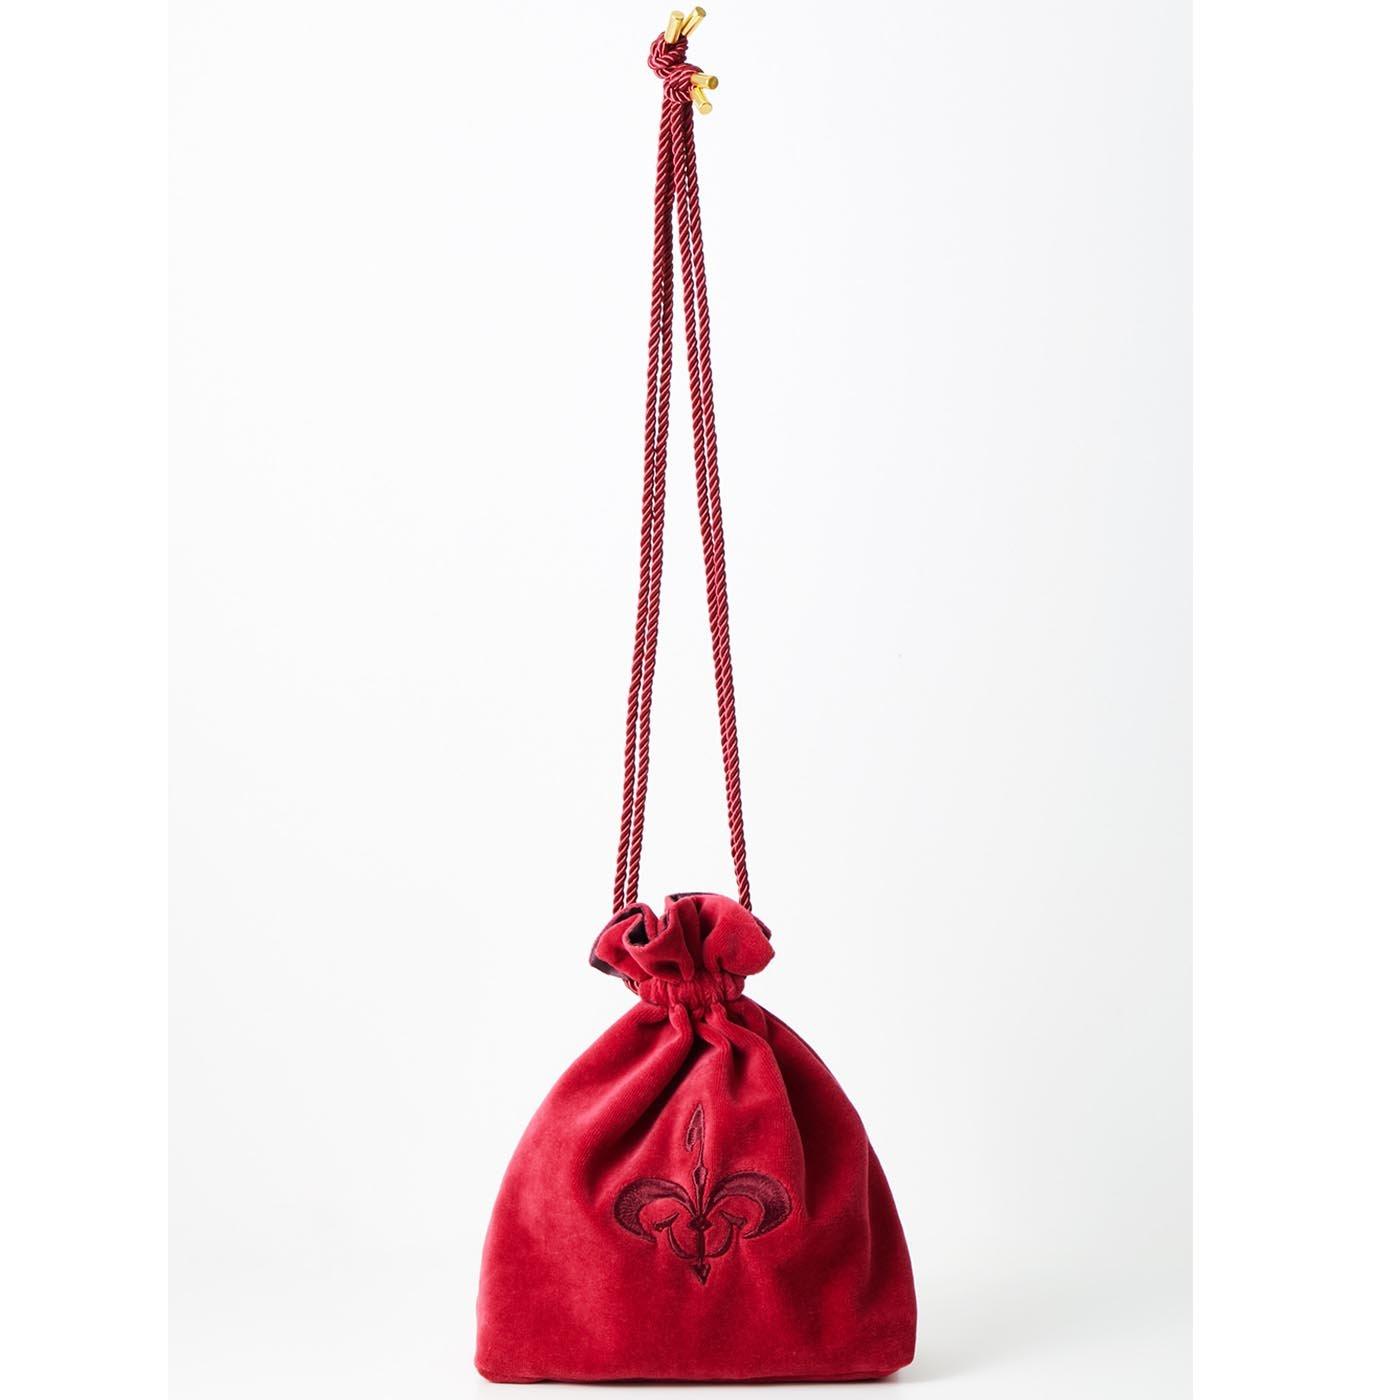 STAR WARS ナブー王室の侍女イメージ巾着バッグ